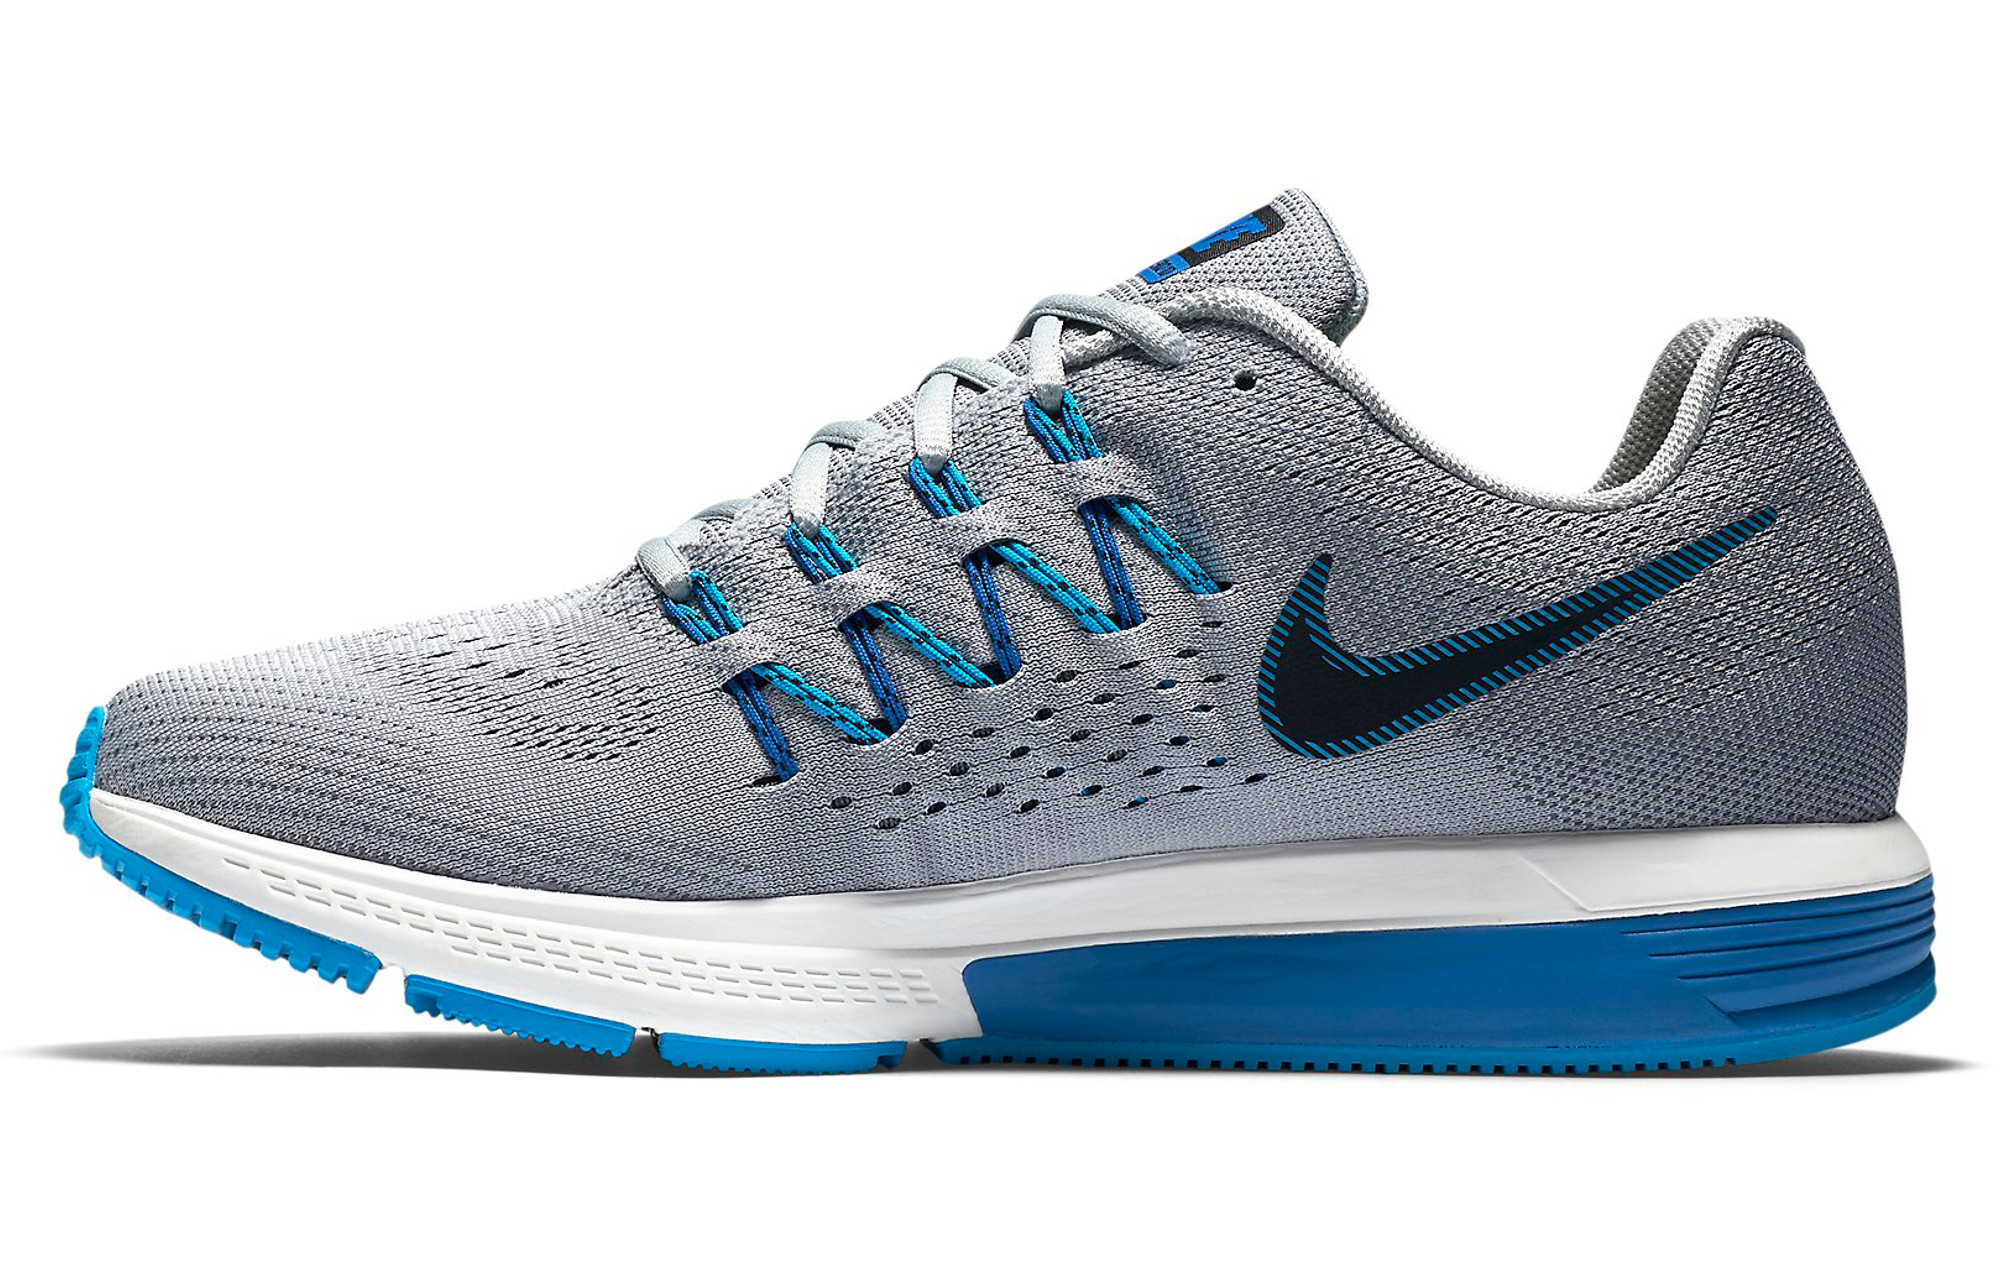 116d56c9df9 NIKE Shoes AIR ZOOM VOMERO 10 Grey Blue Men